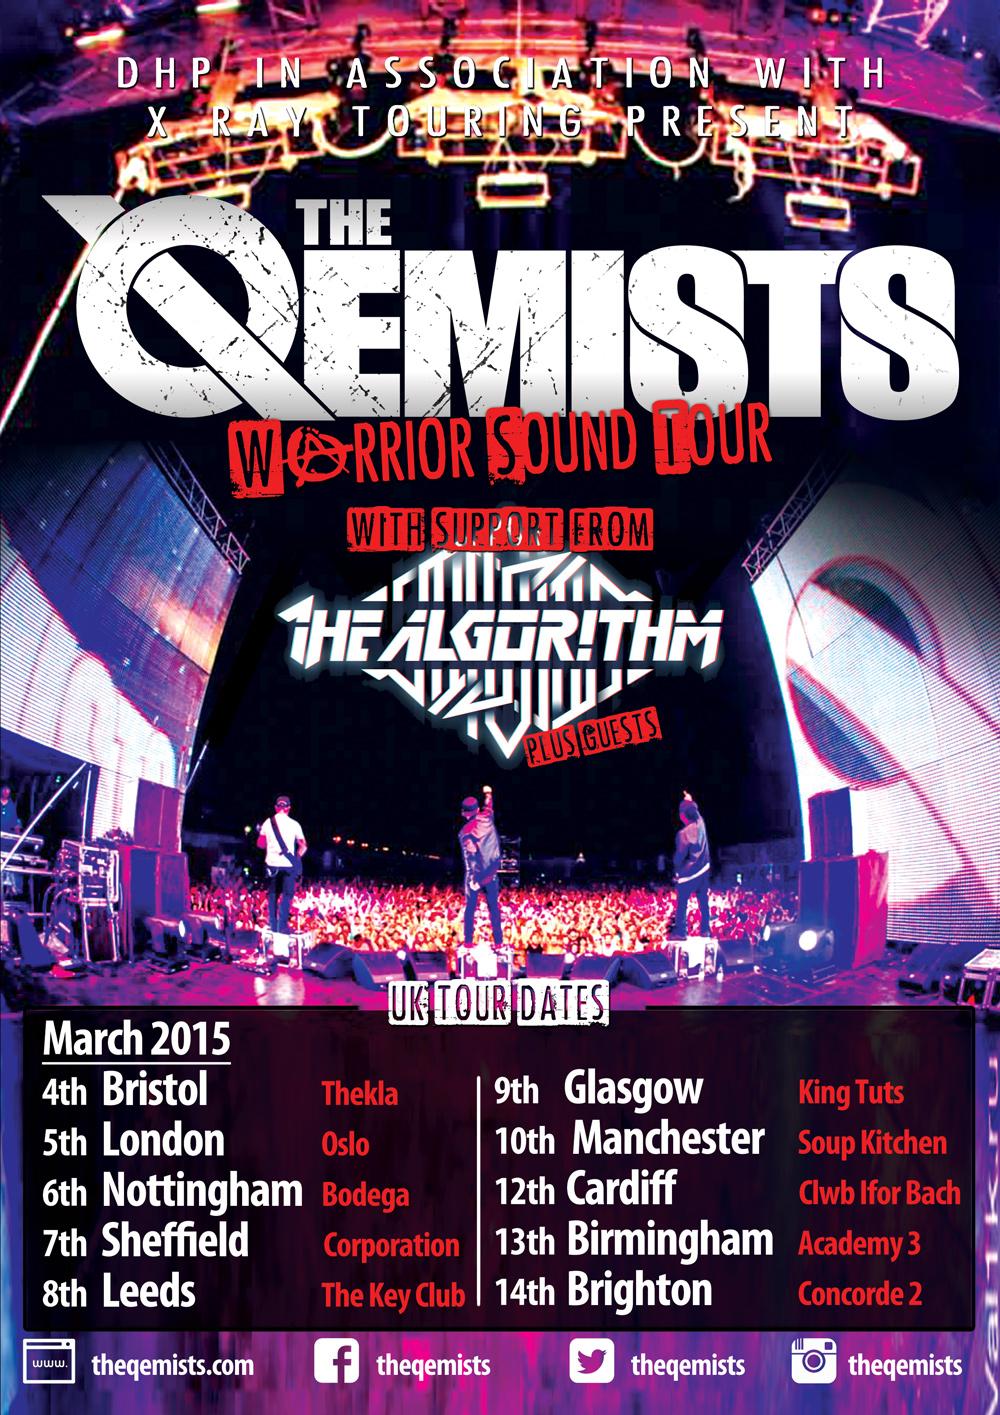 thealgorithm-theqemists-uktour-2015